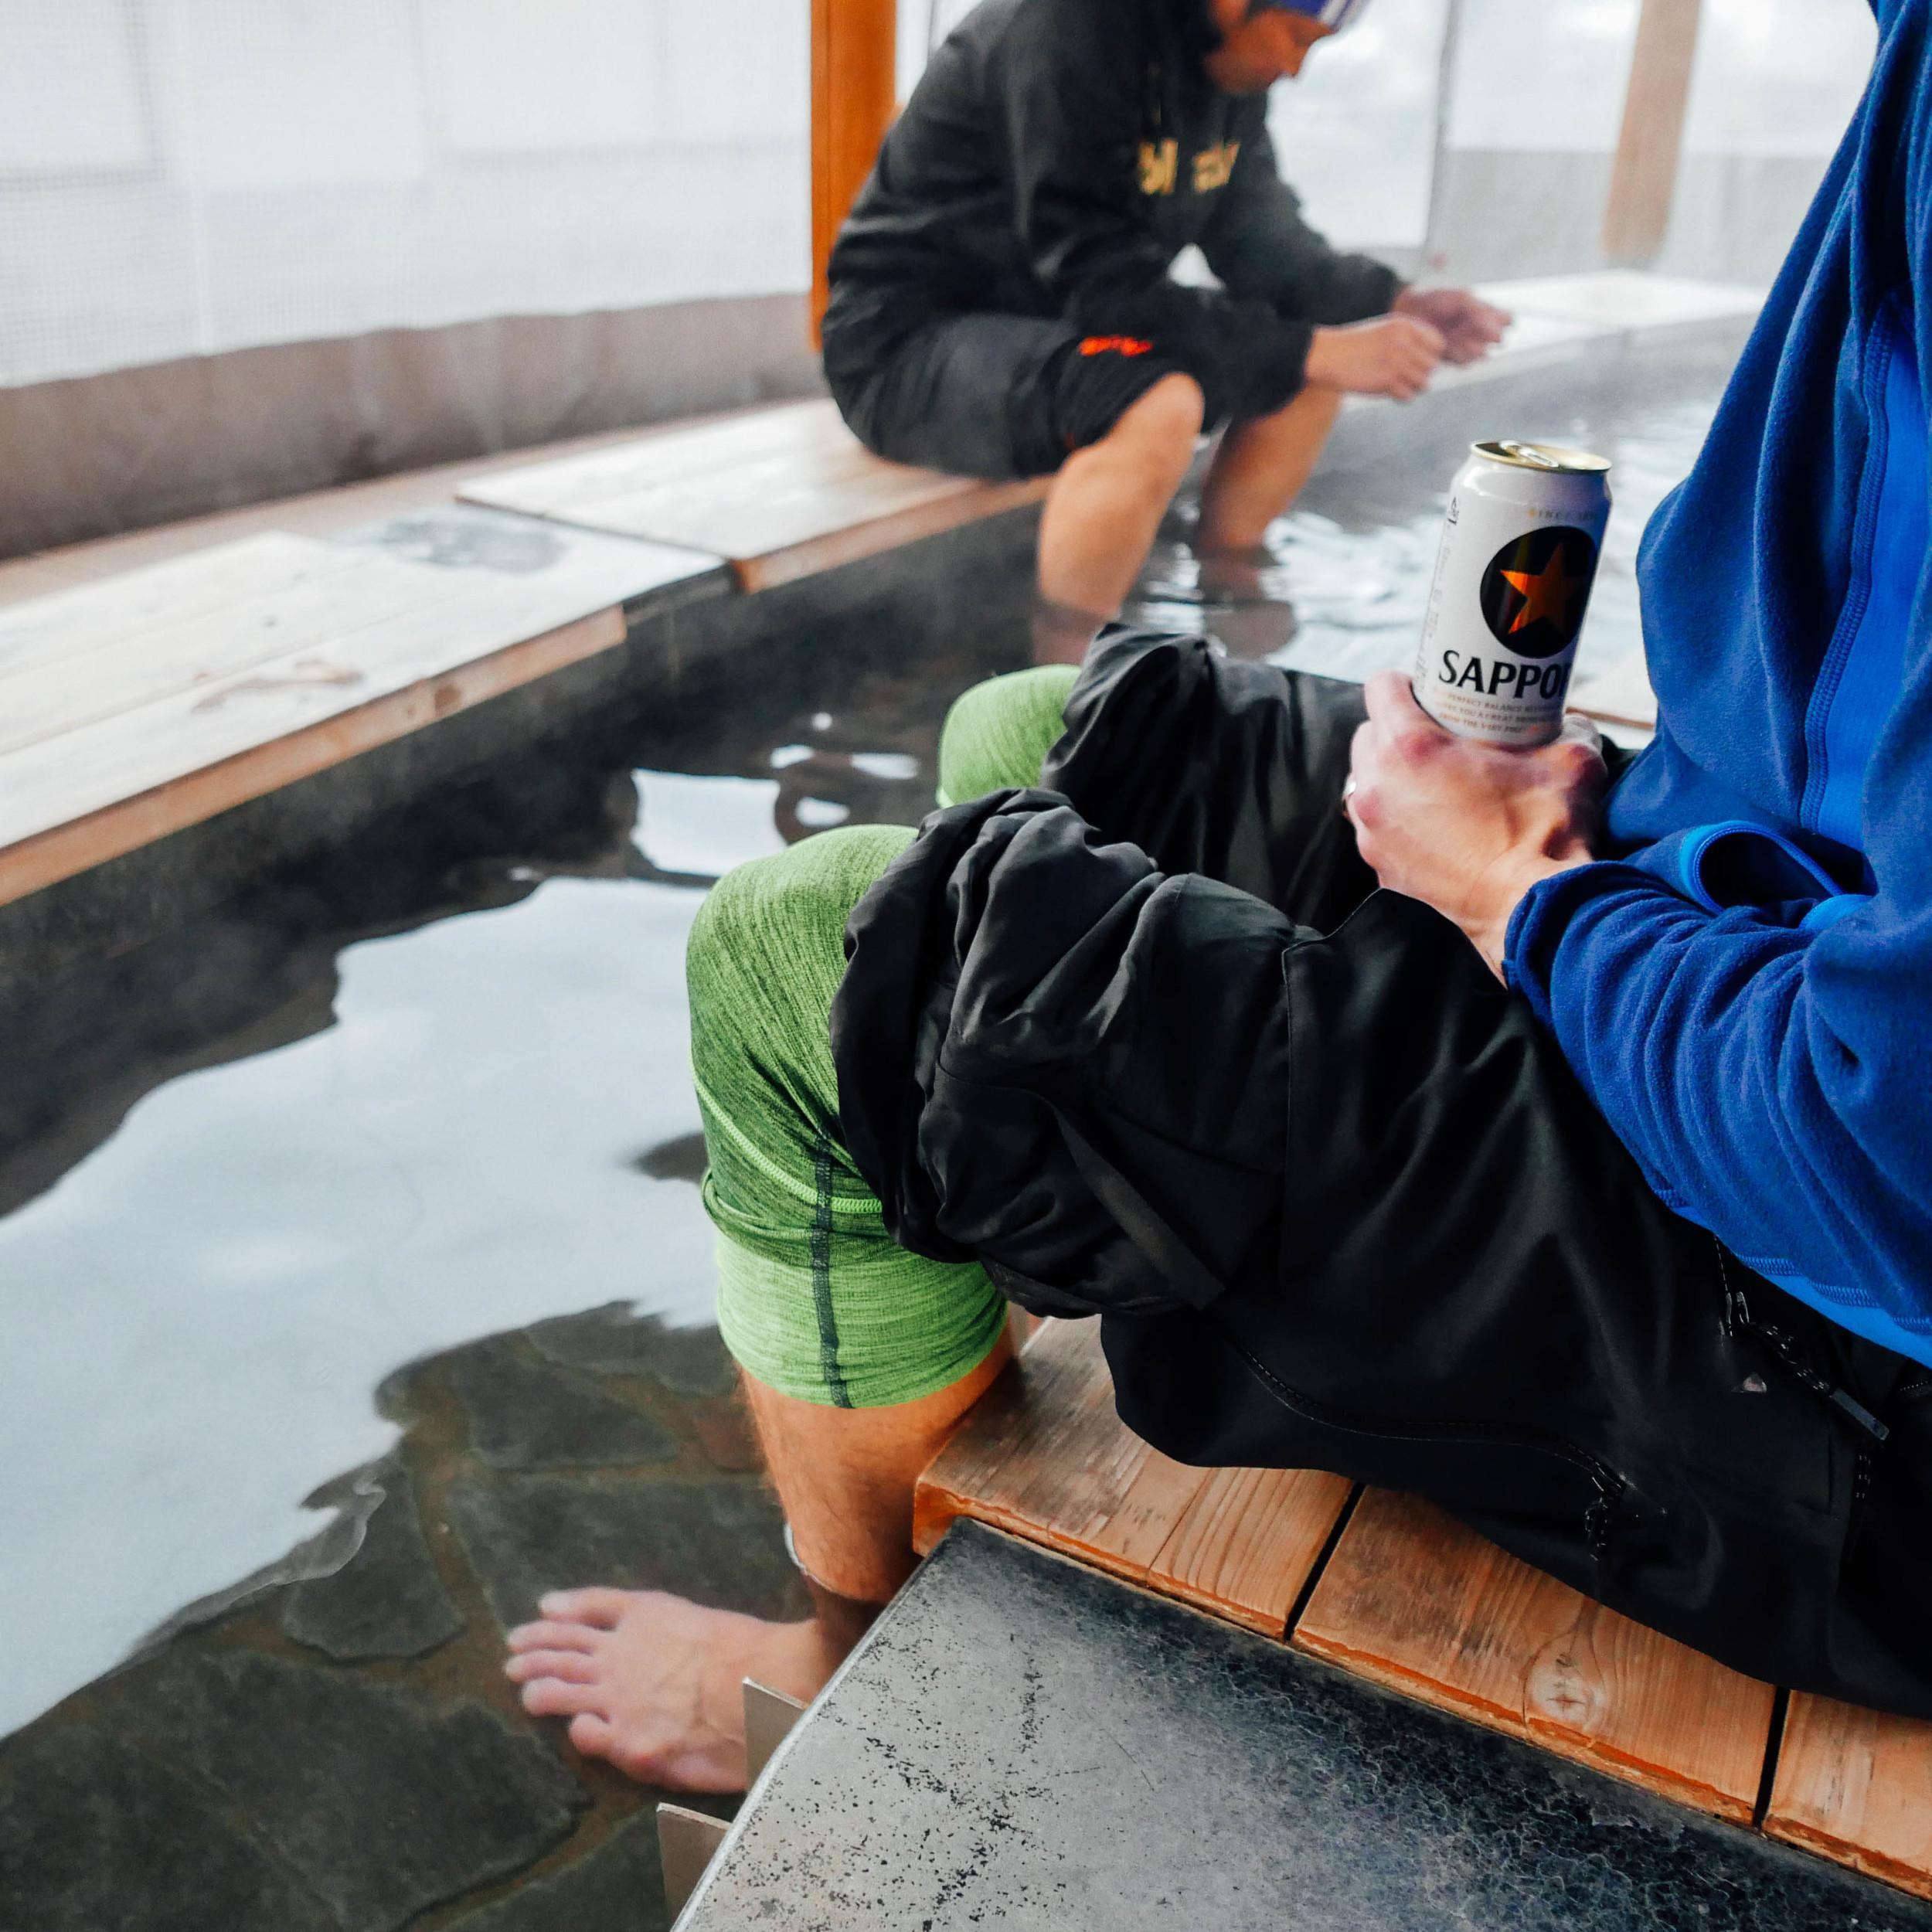 Apres-ski, Japanese style: foot baths and beer.